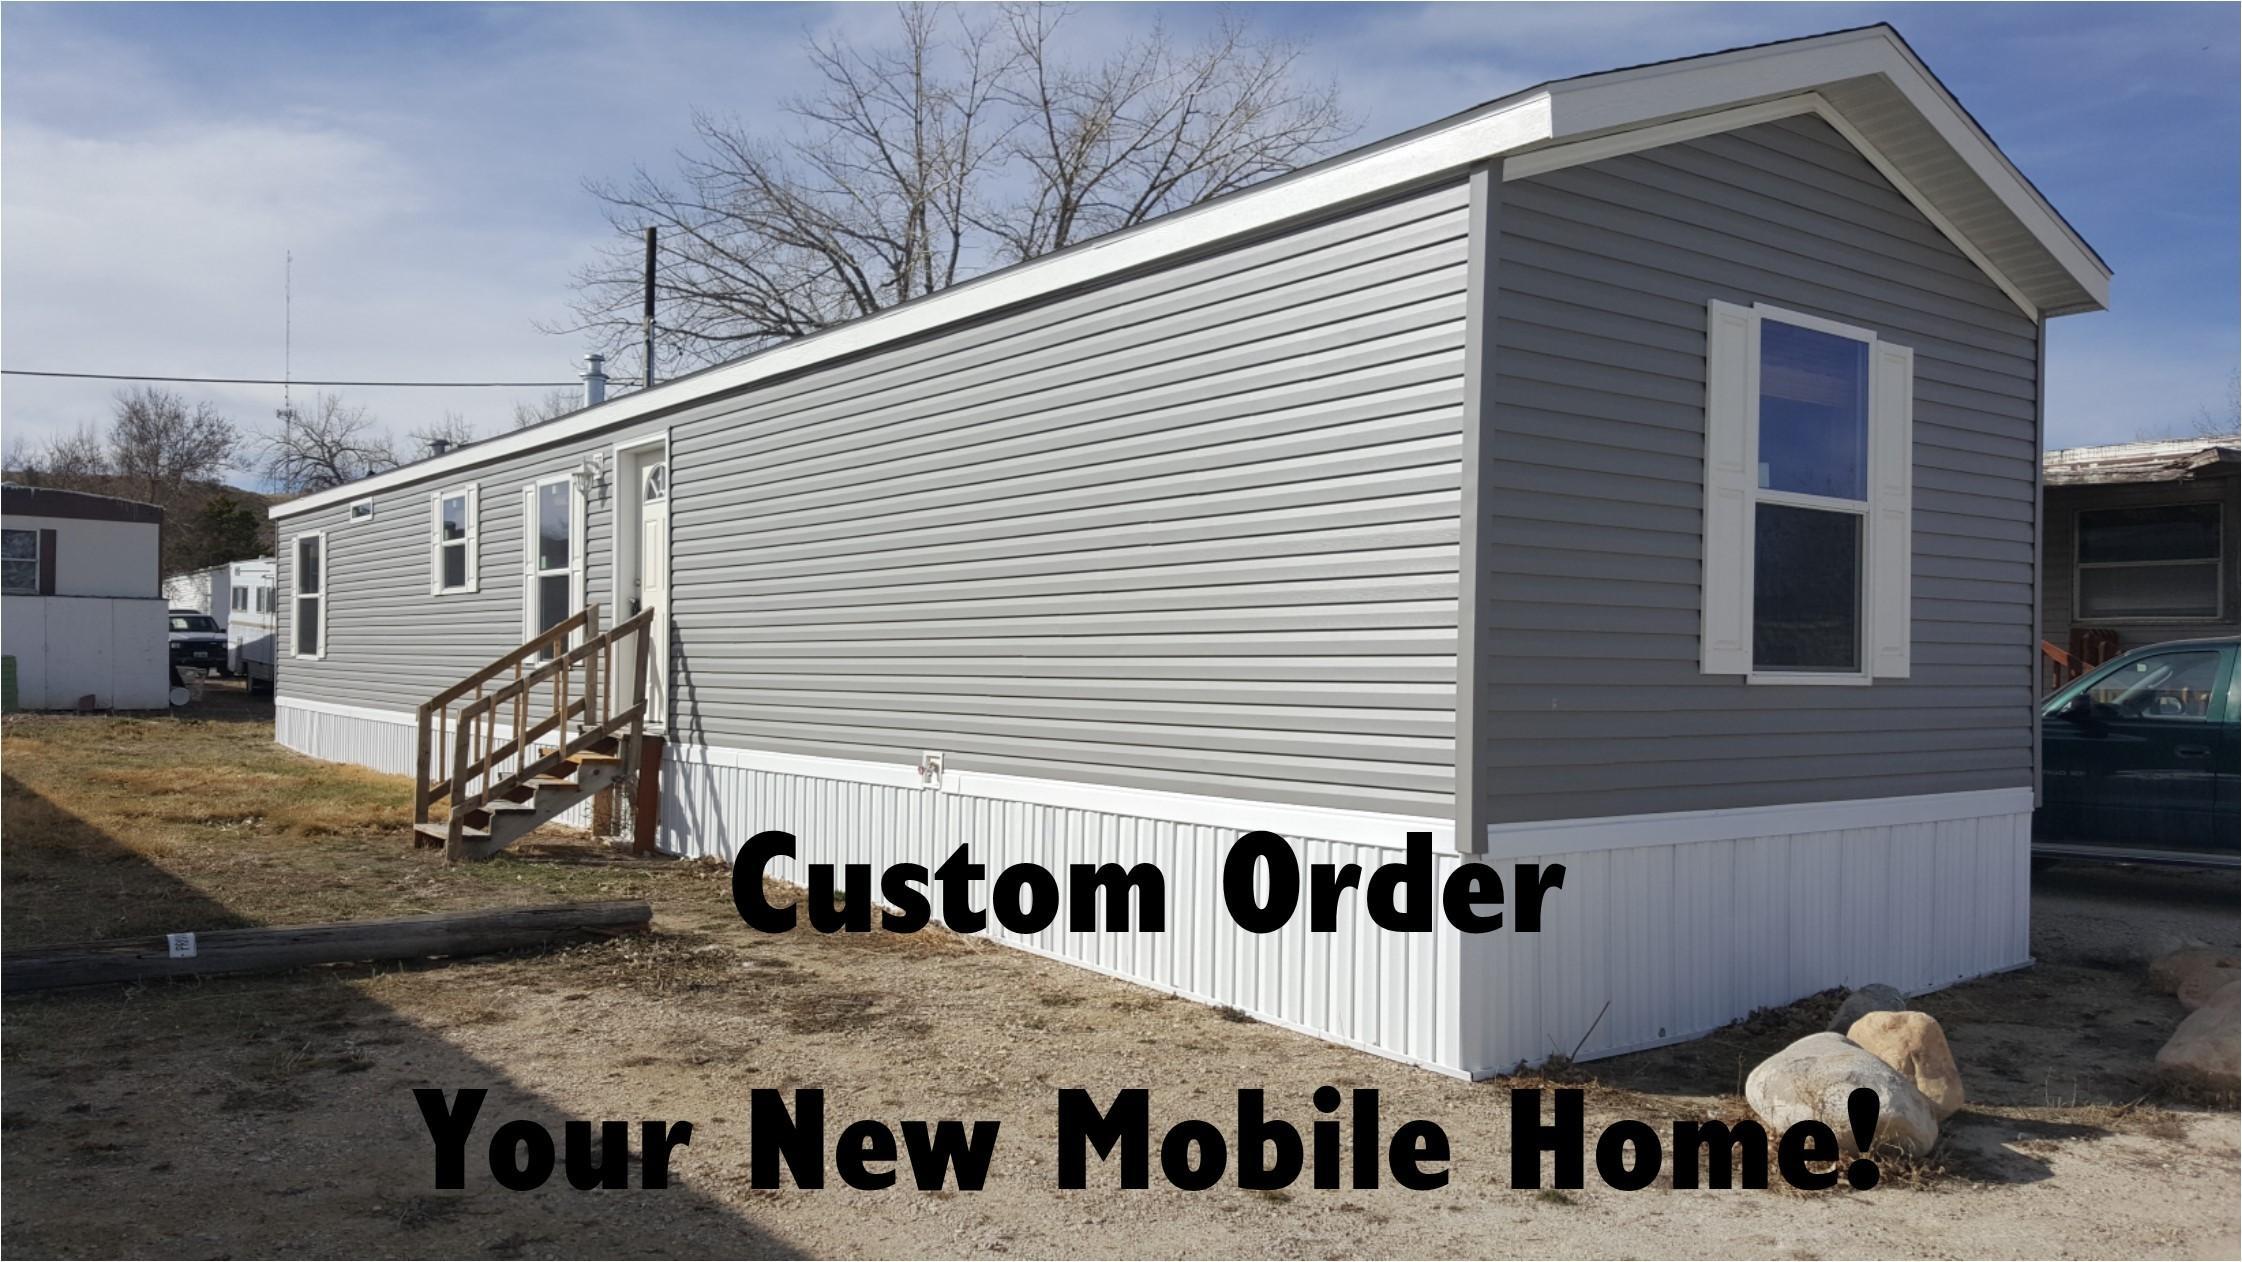 965 Fetterman Street, Buffalo, Wyoming 82834, 3 Bedrooms Bedrooms, ,2 BathroomsBathrooms,Residential,For Sale,Fetterman,18-1223